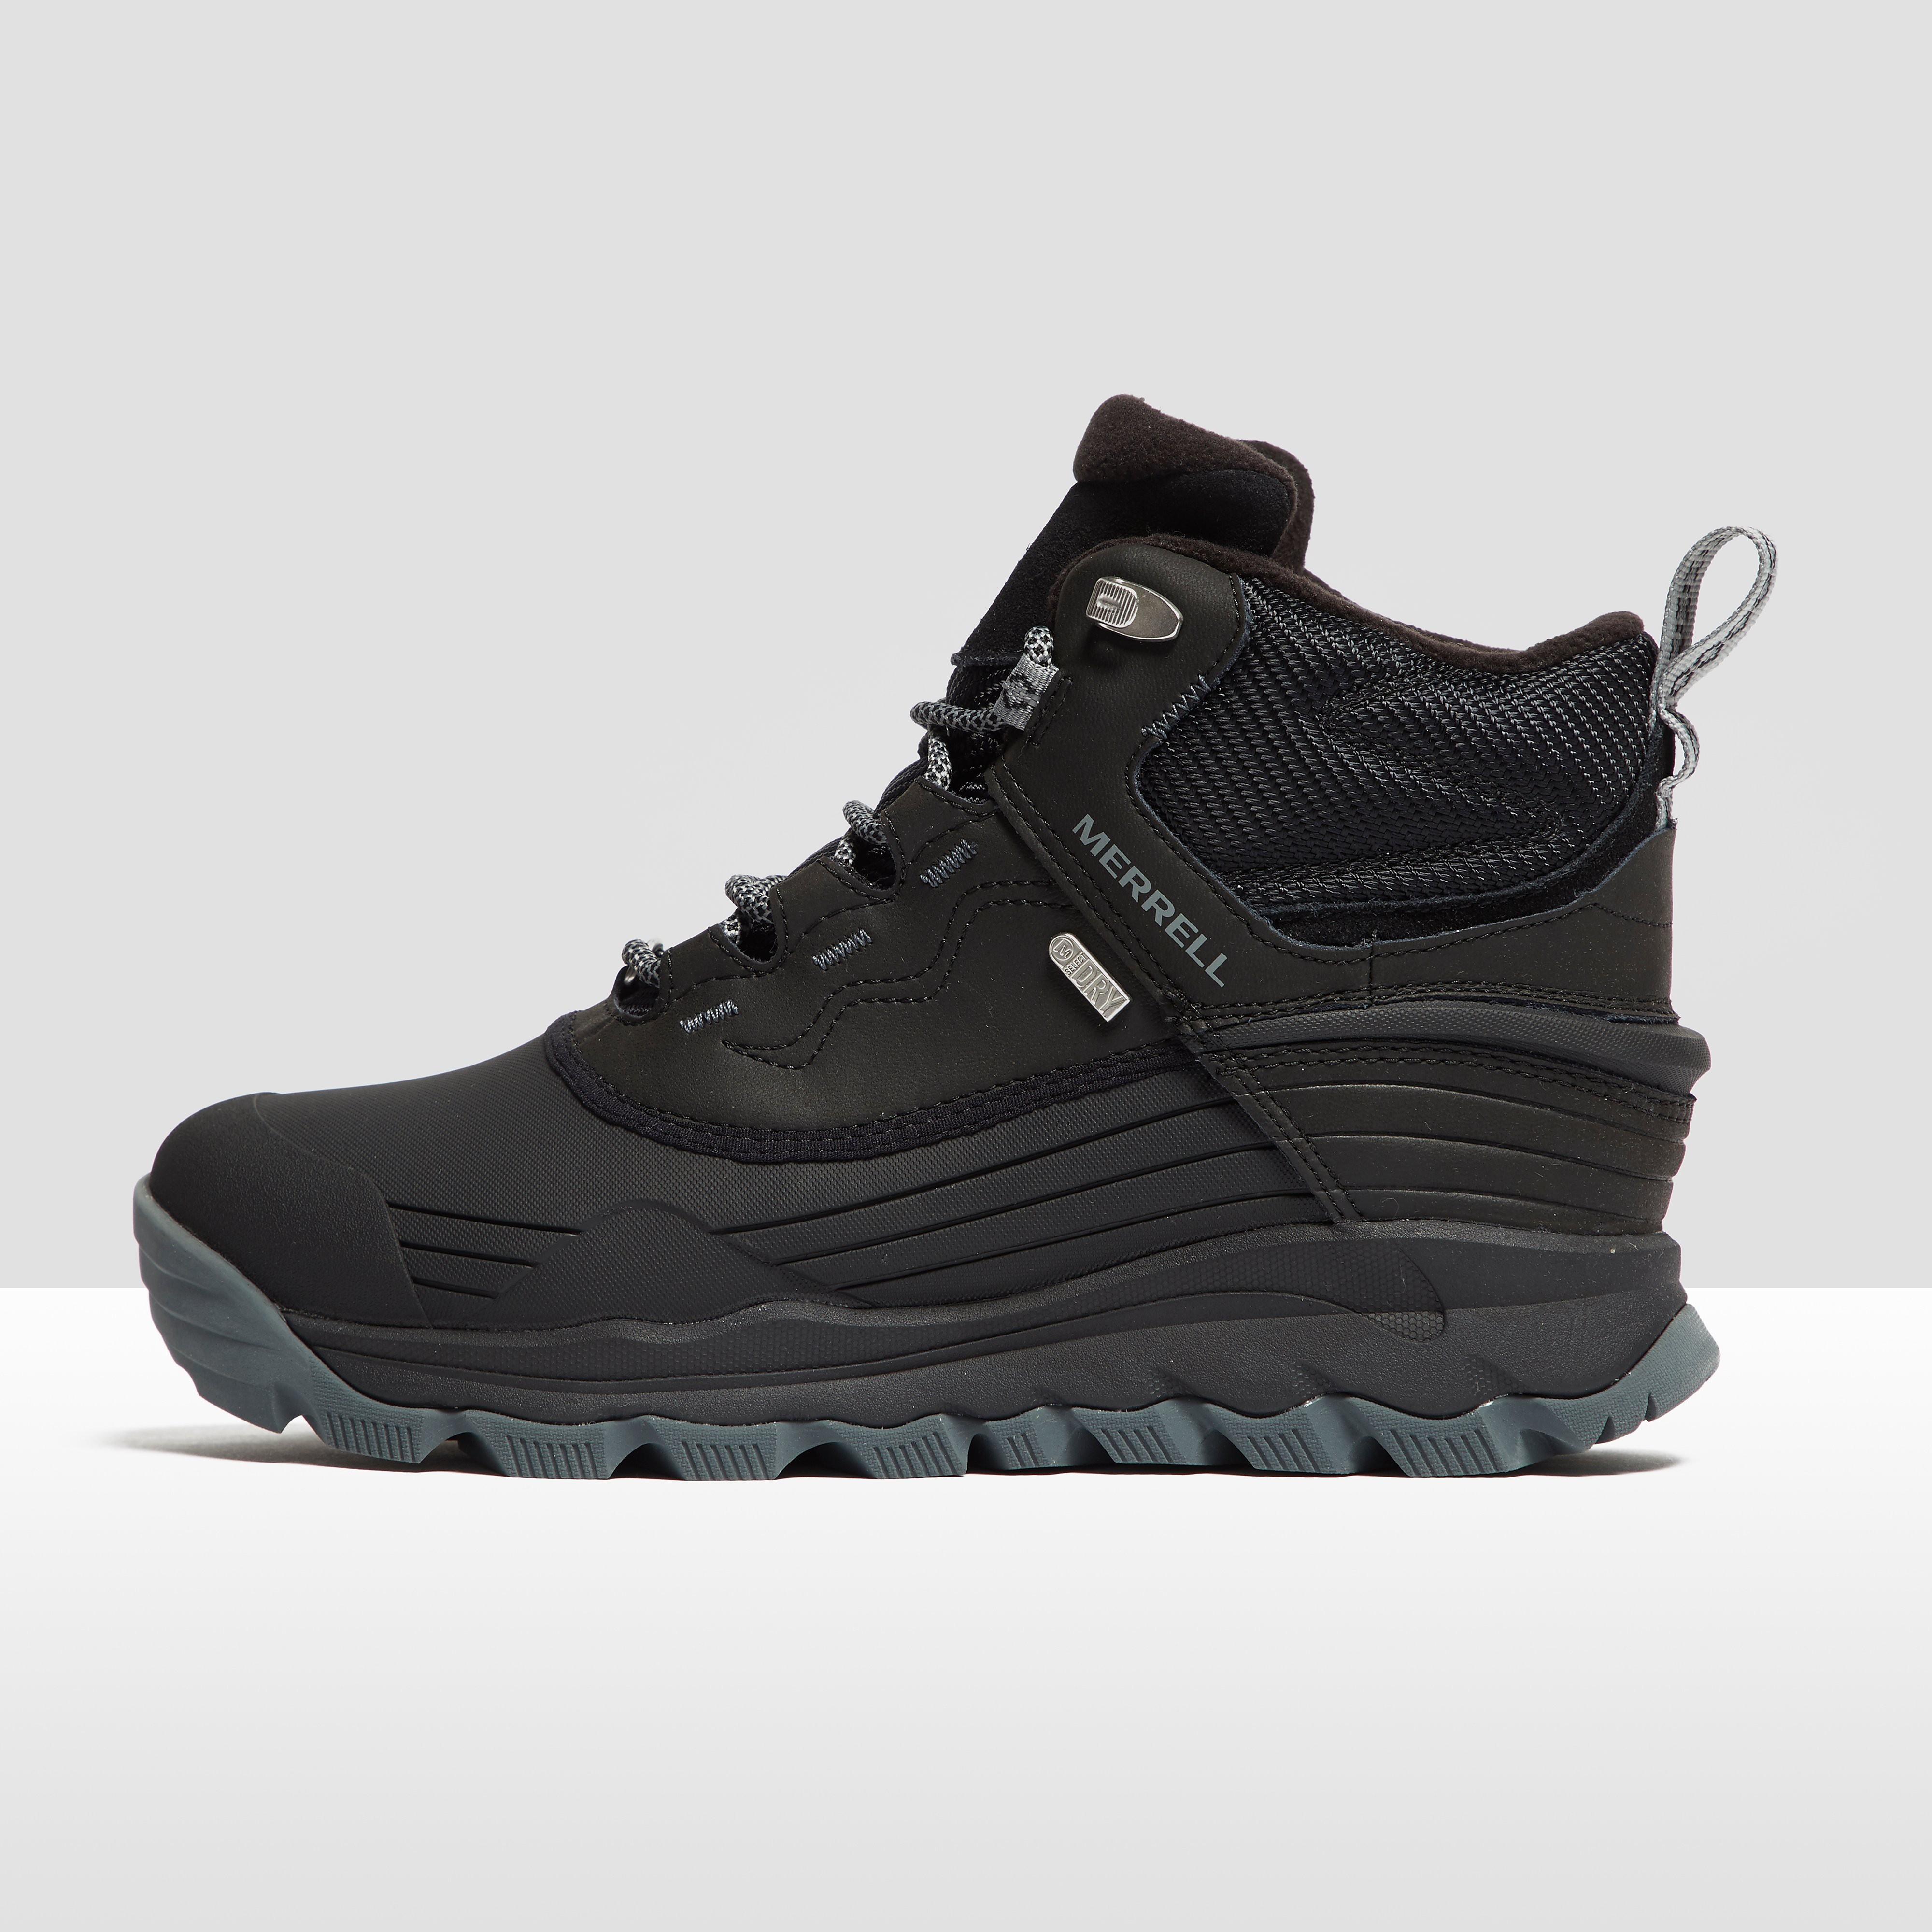 "Merrell Thermo Vortex 6"" Men's Boots"